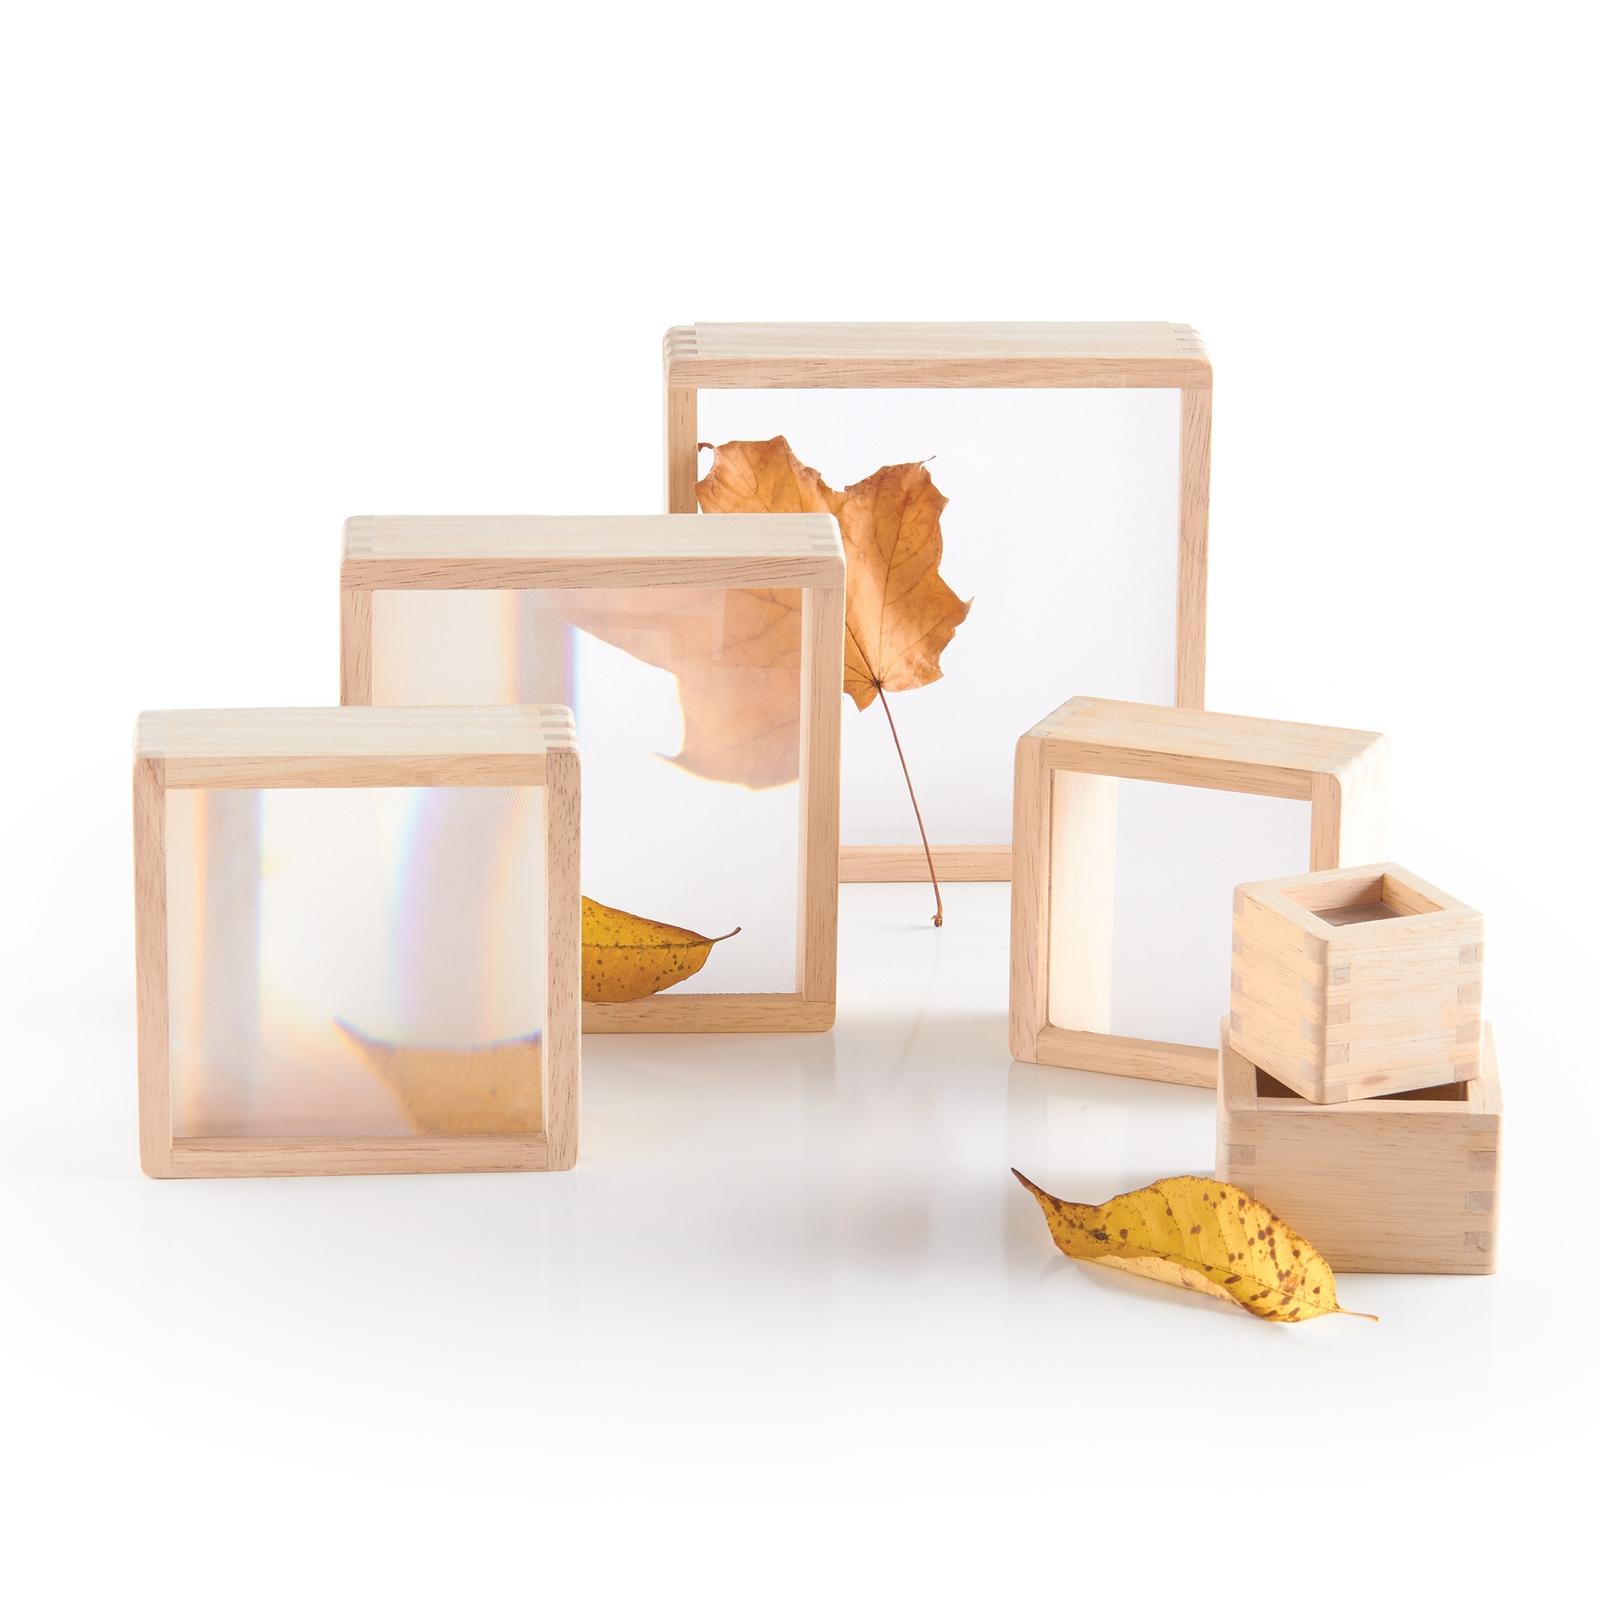 Magnification Blocks